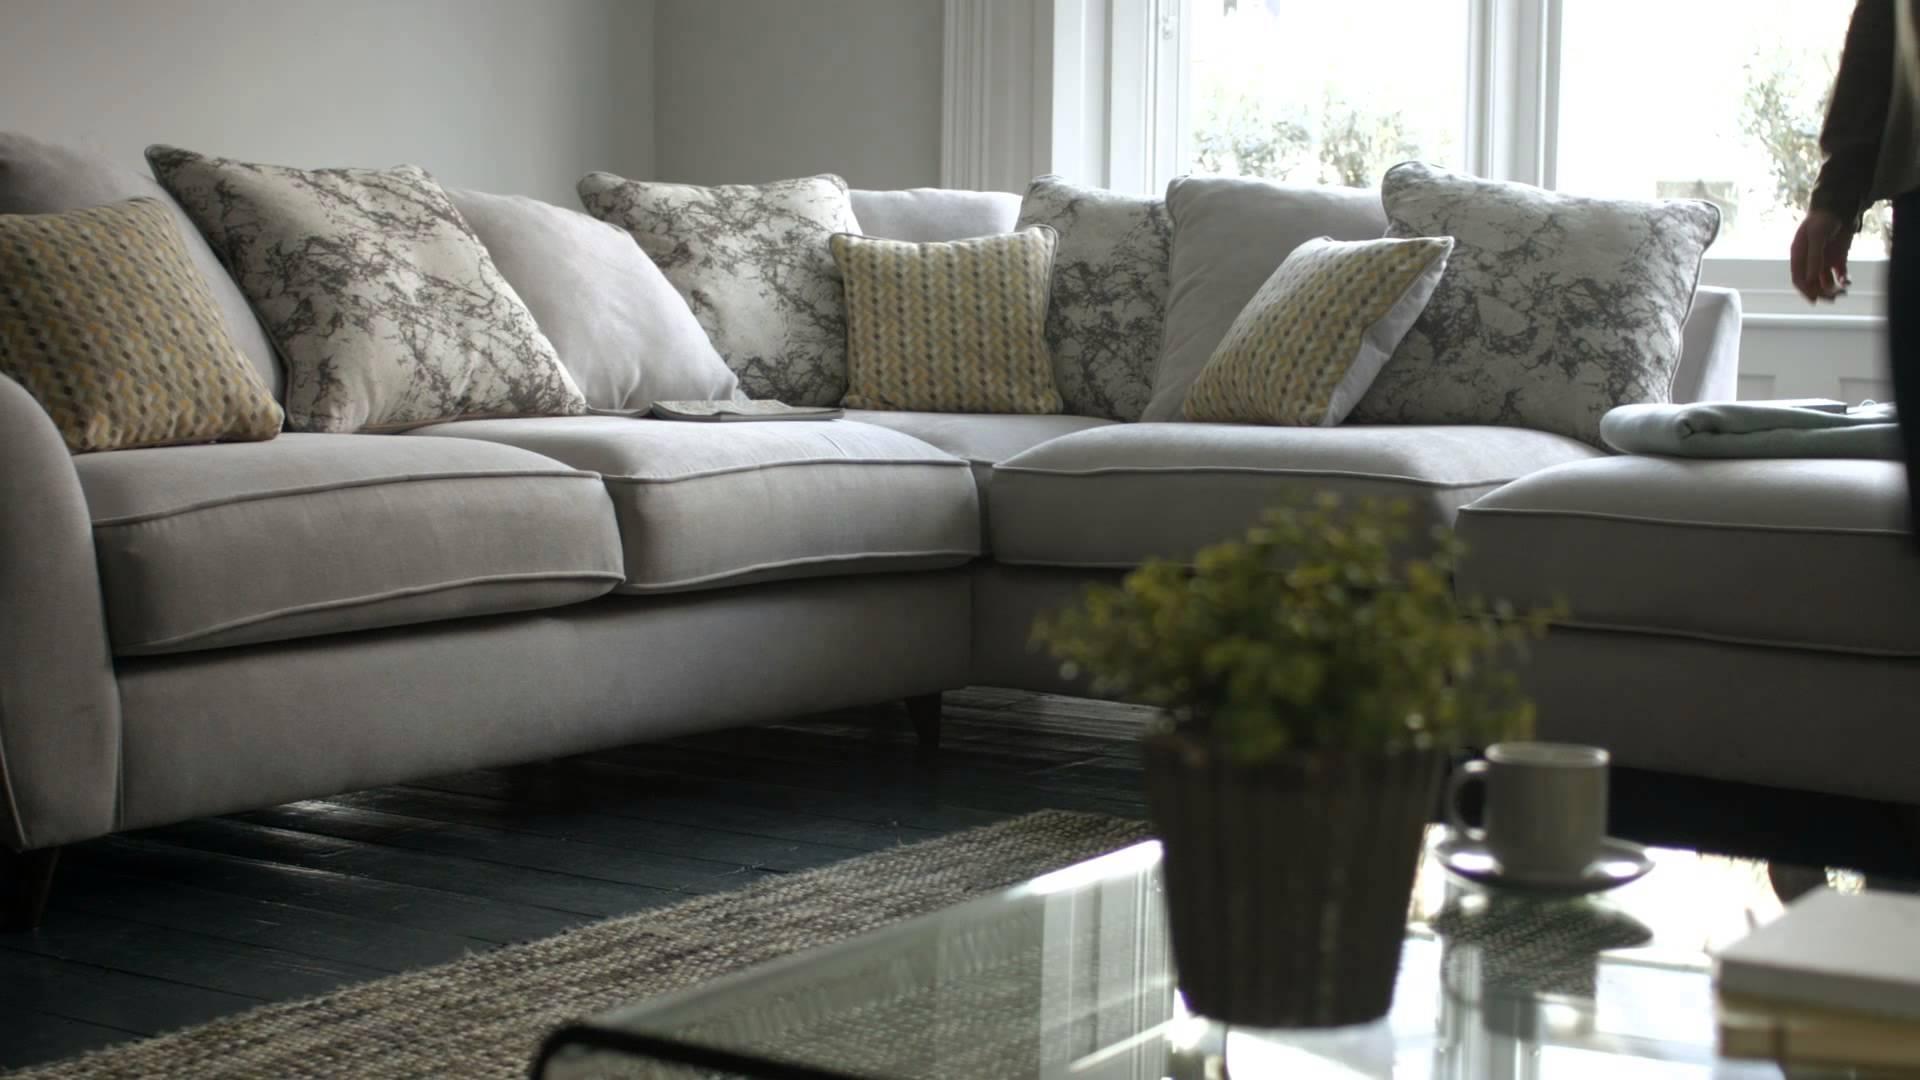 Fabric Modular Sofas & Corner Sofas – Carrara | Furniture Village Within Corner Sofa Chairs (View 8 of 20)